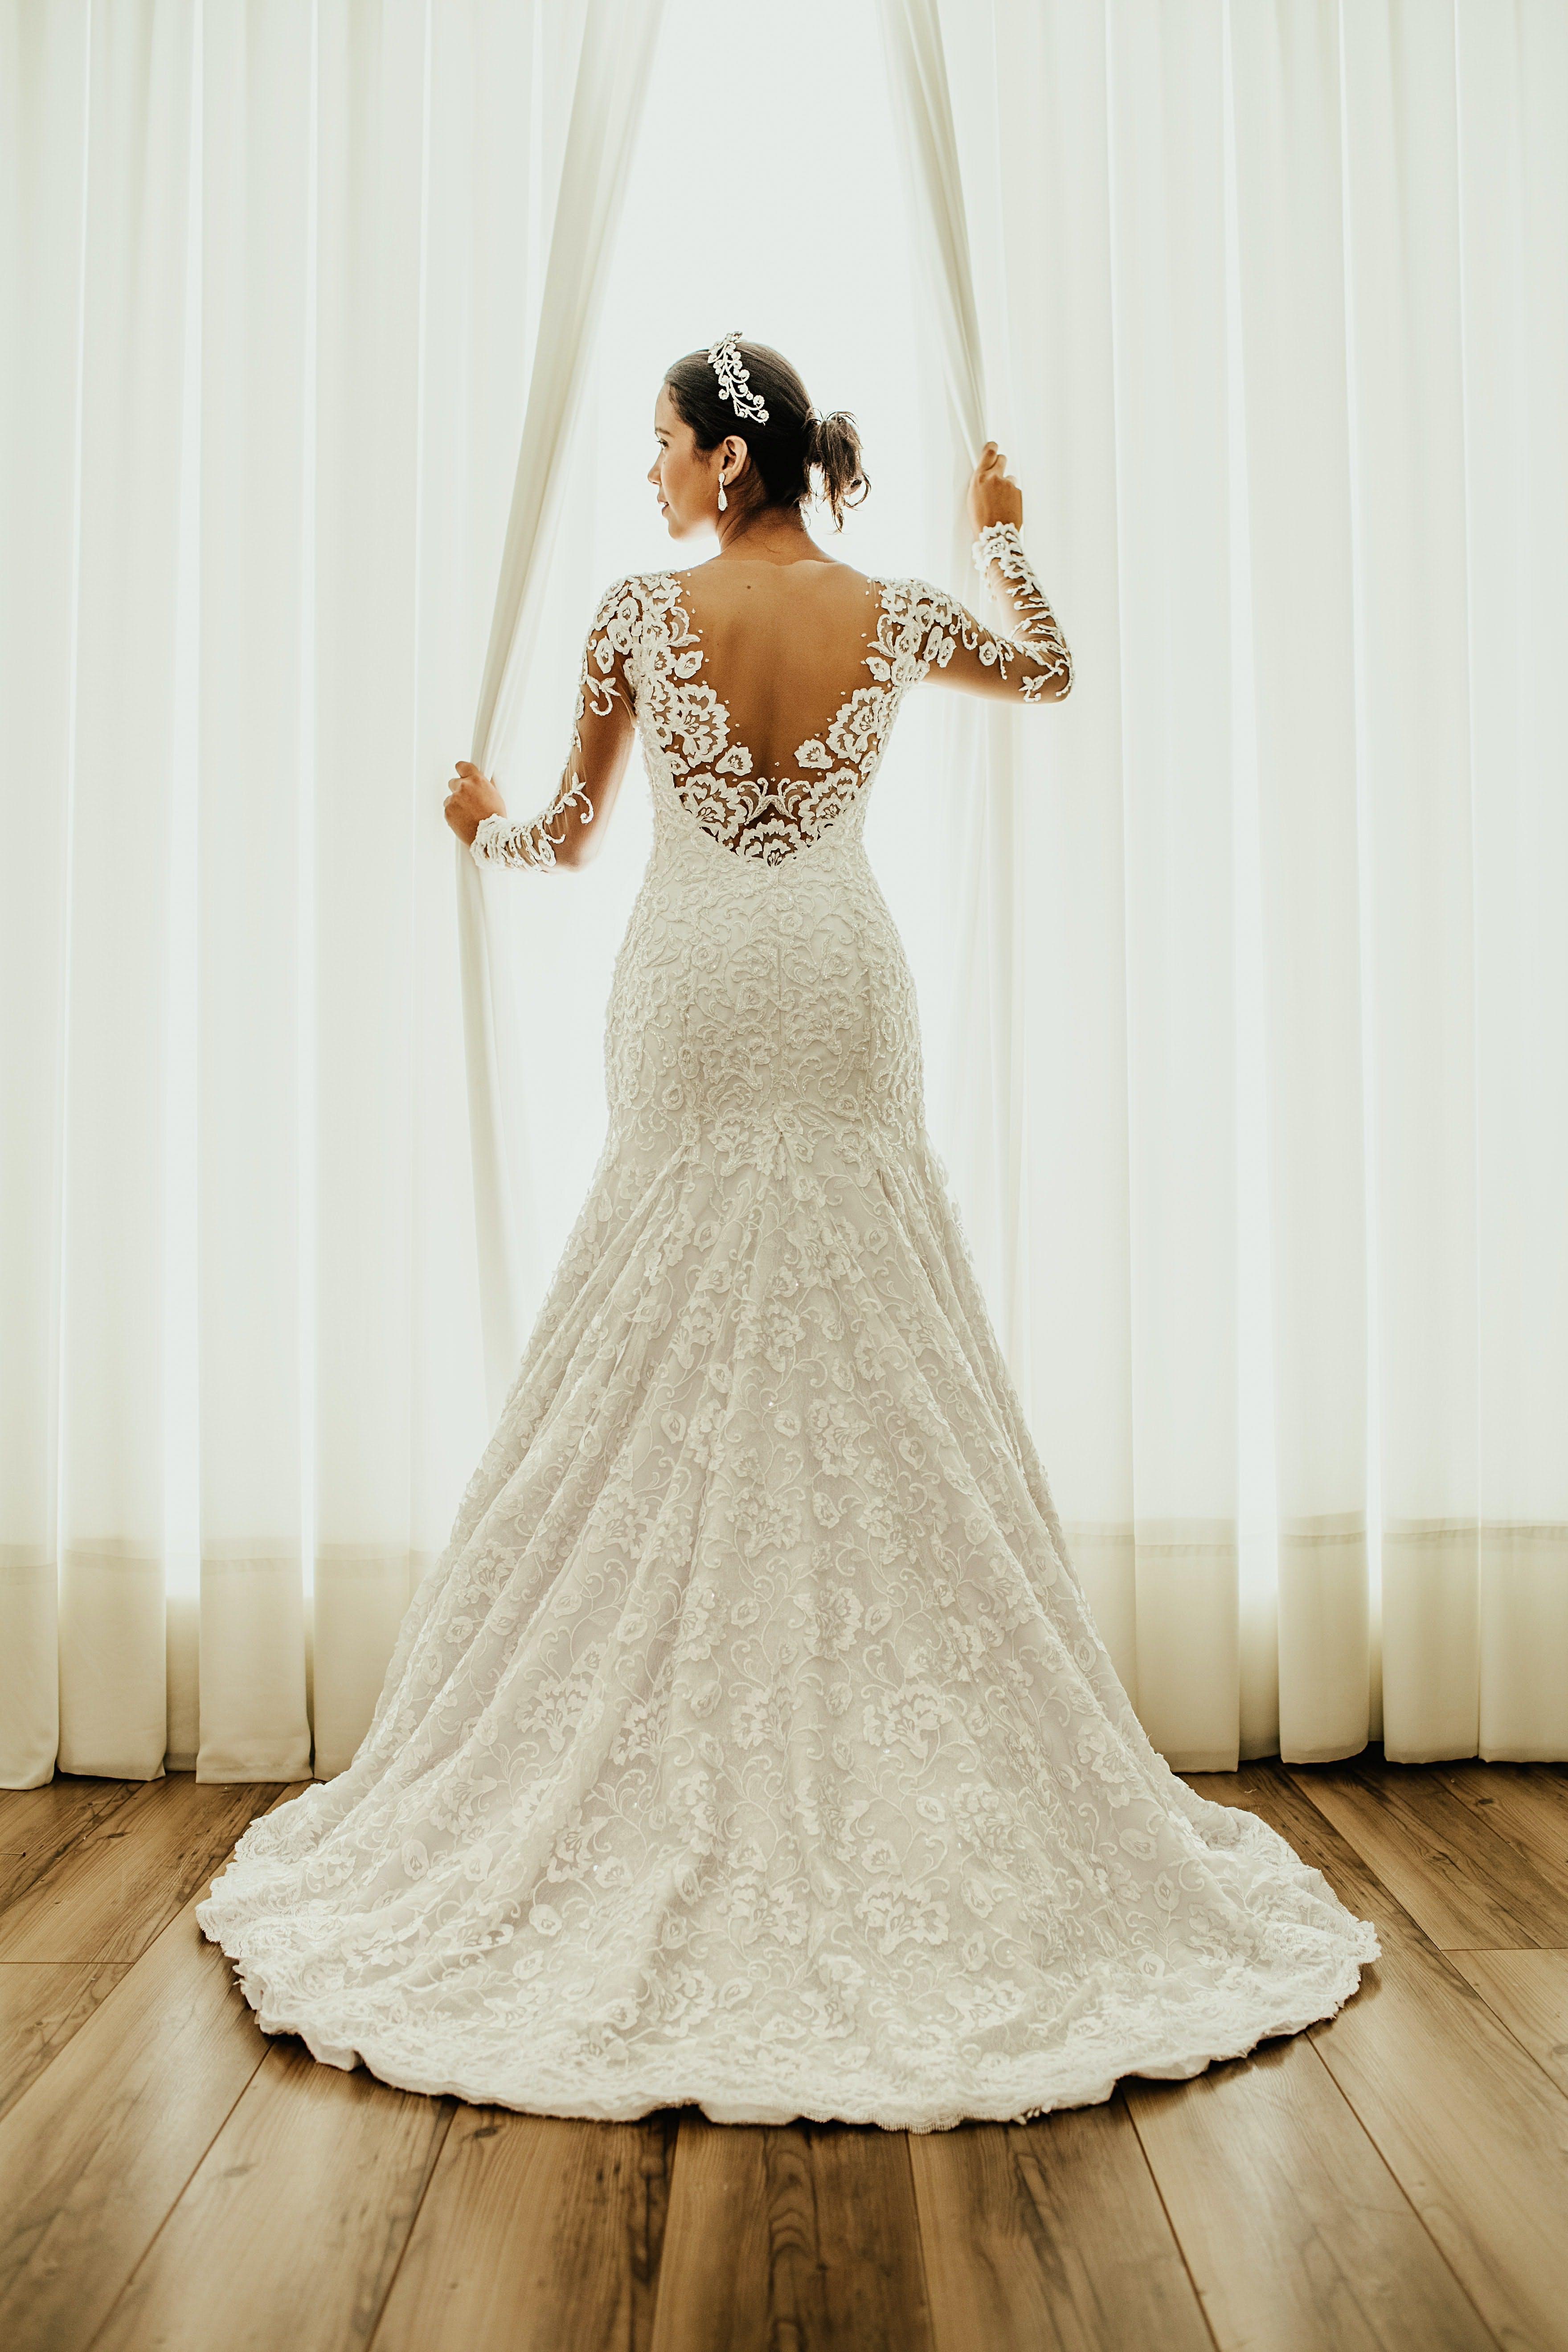 photo robe de mariée, photographe mariage